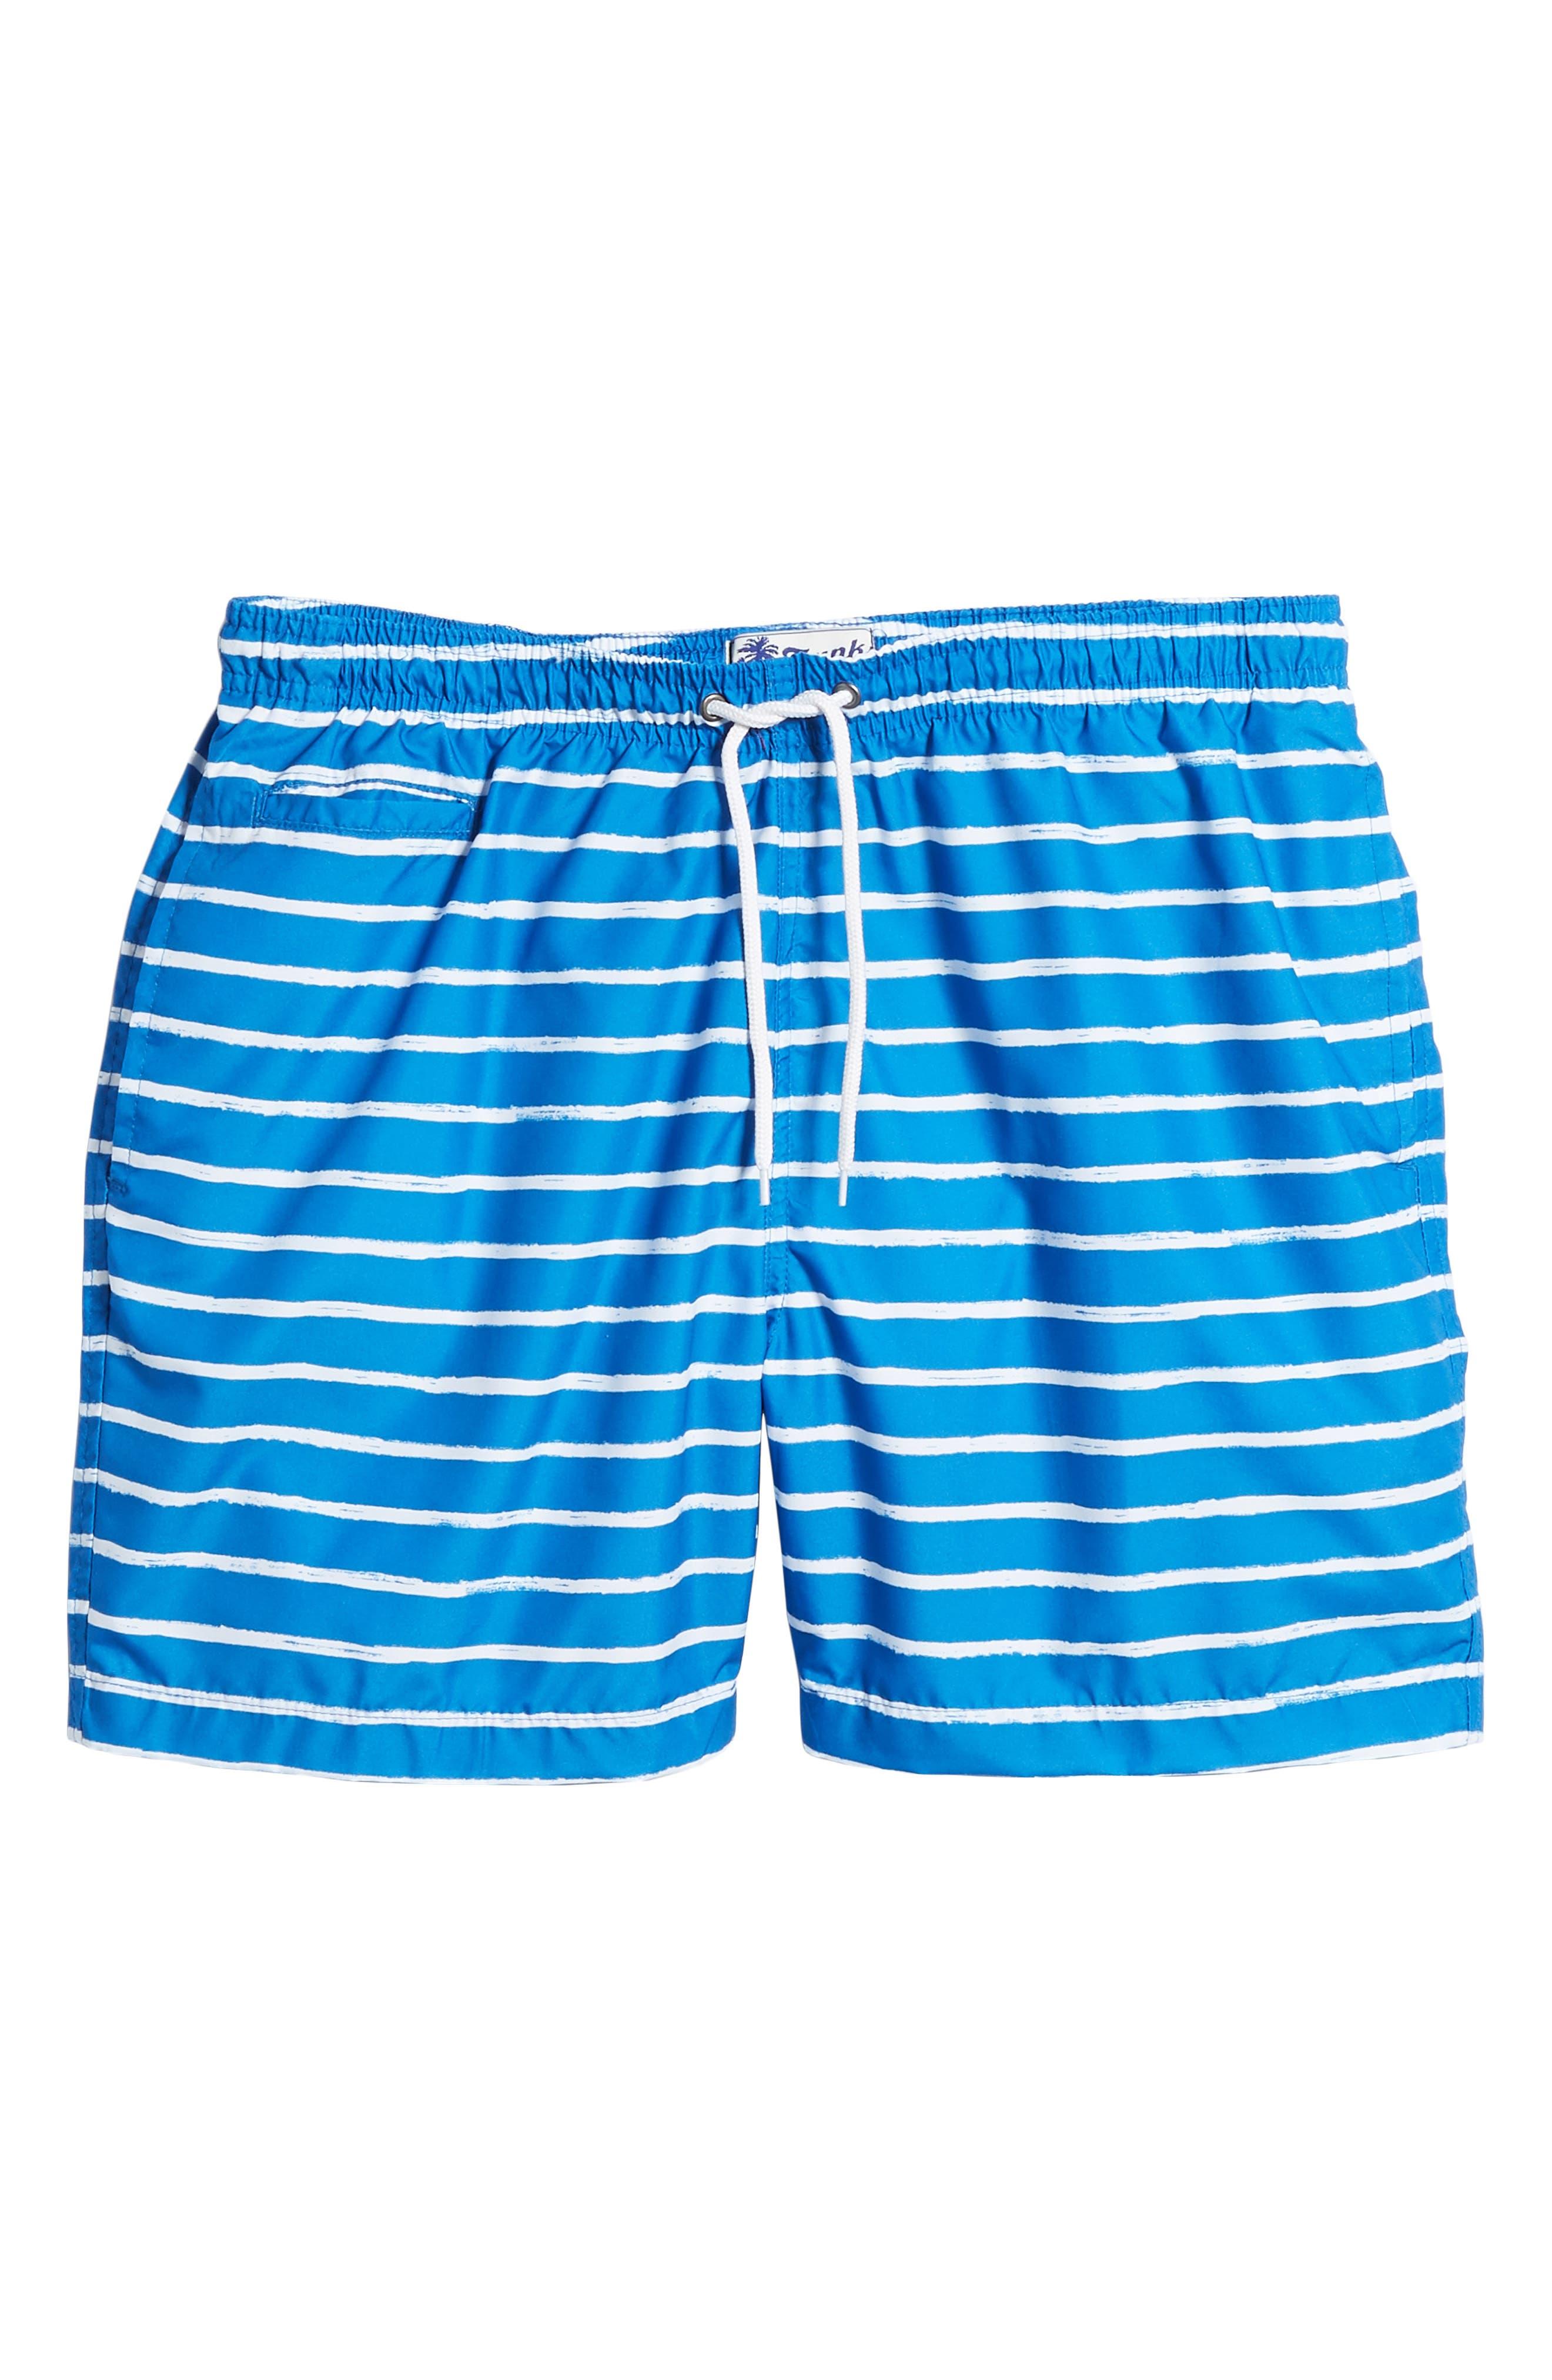 San O Stripe Swim Trunks,                             Alternate thumbnail 6, color,                             416